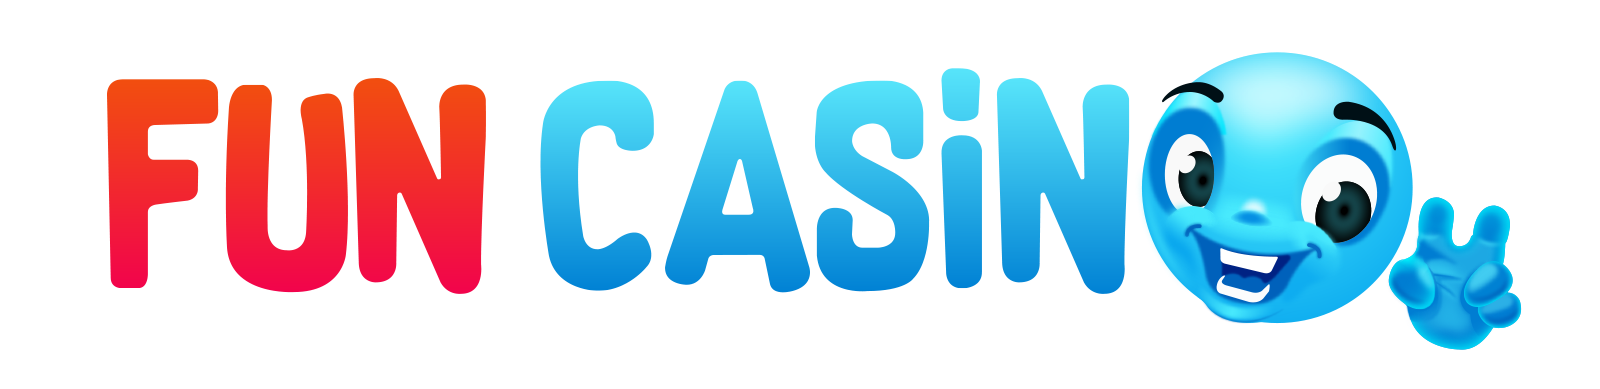 FunCasino Review